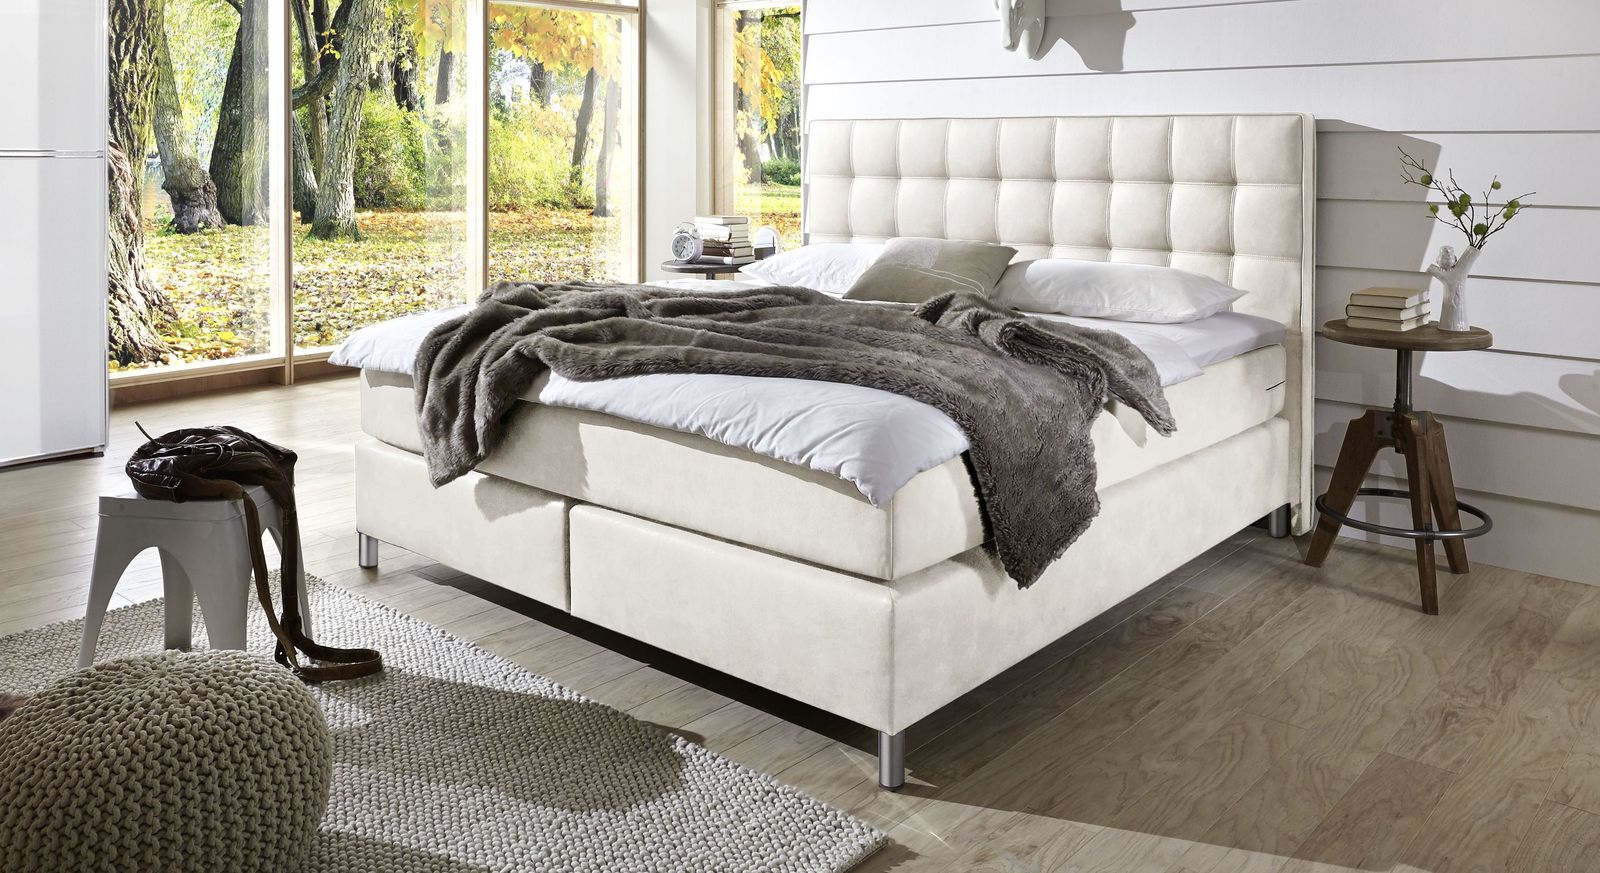 Boxspringbett Zamora aus elegantem Luxuskunstleder in Weiß